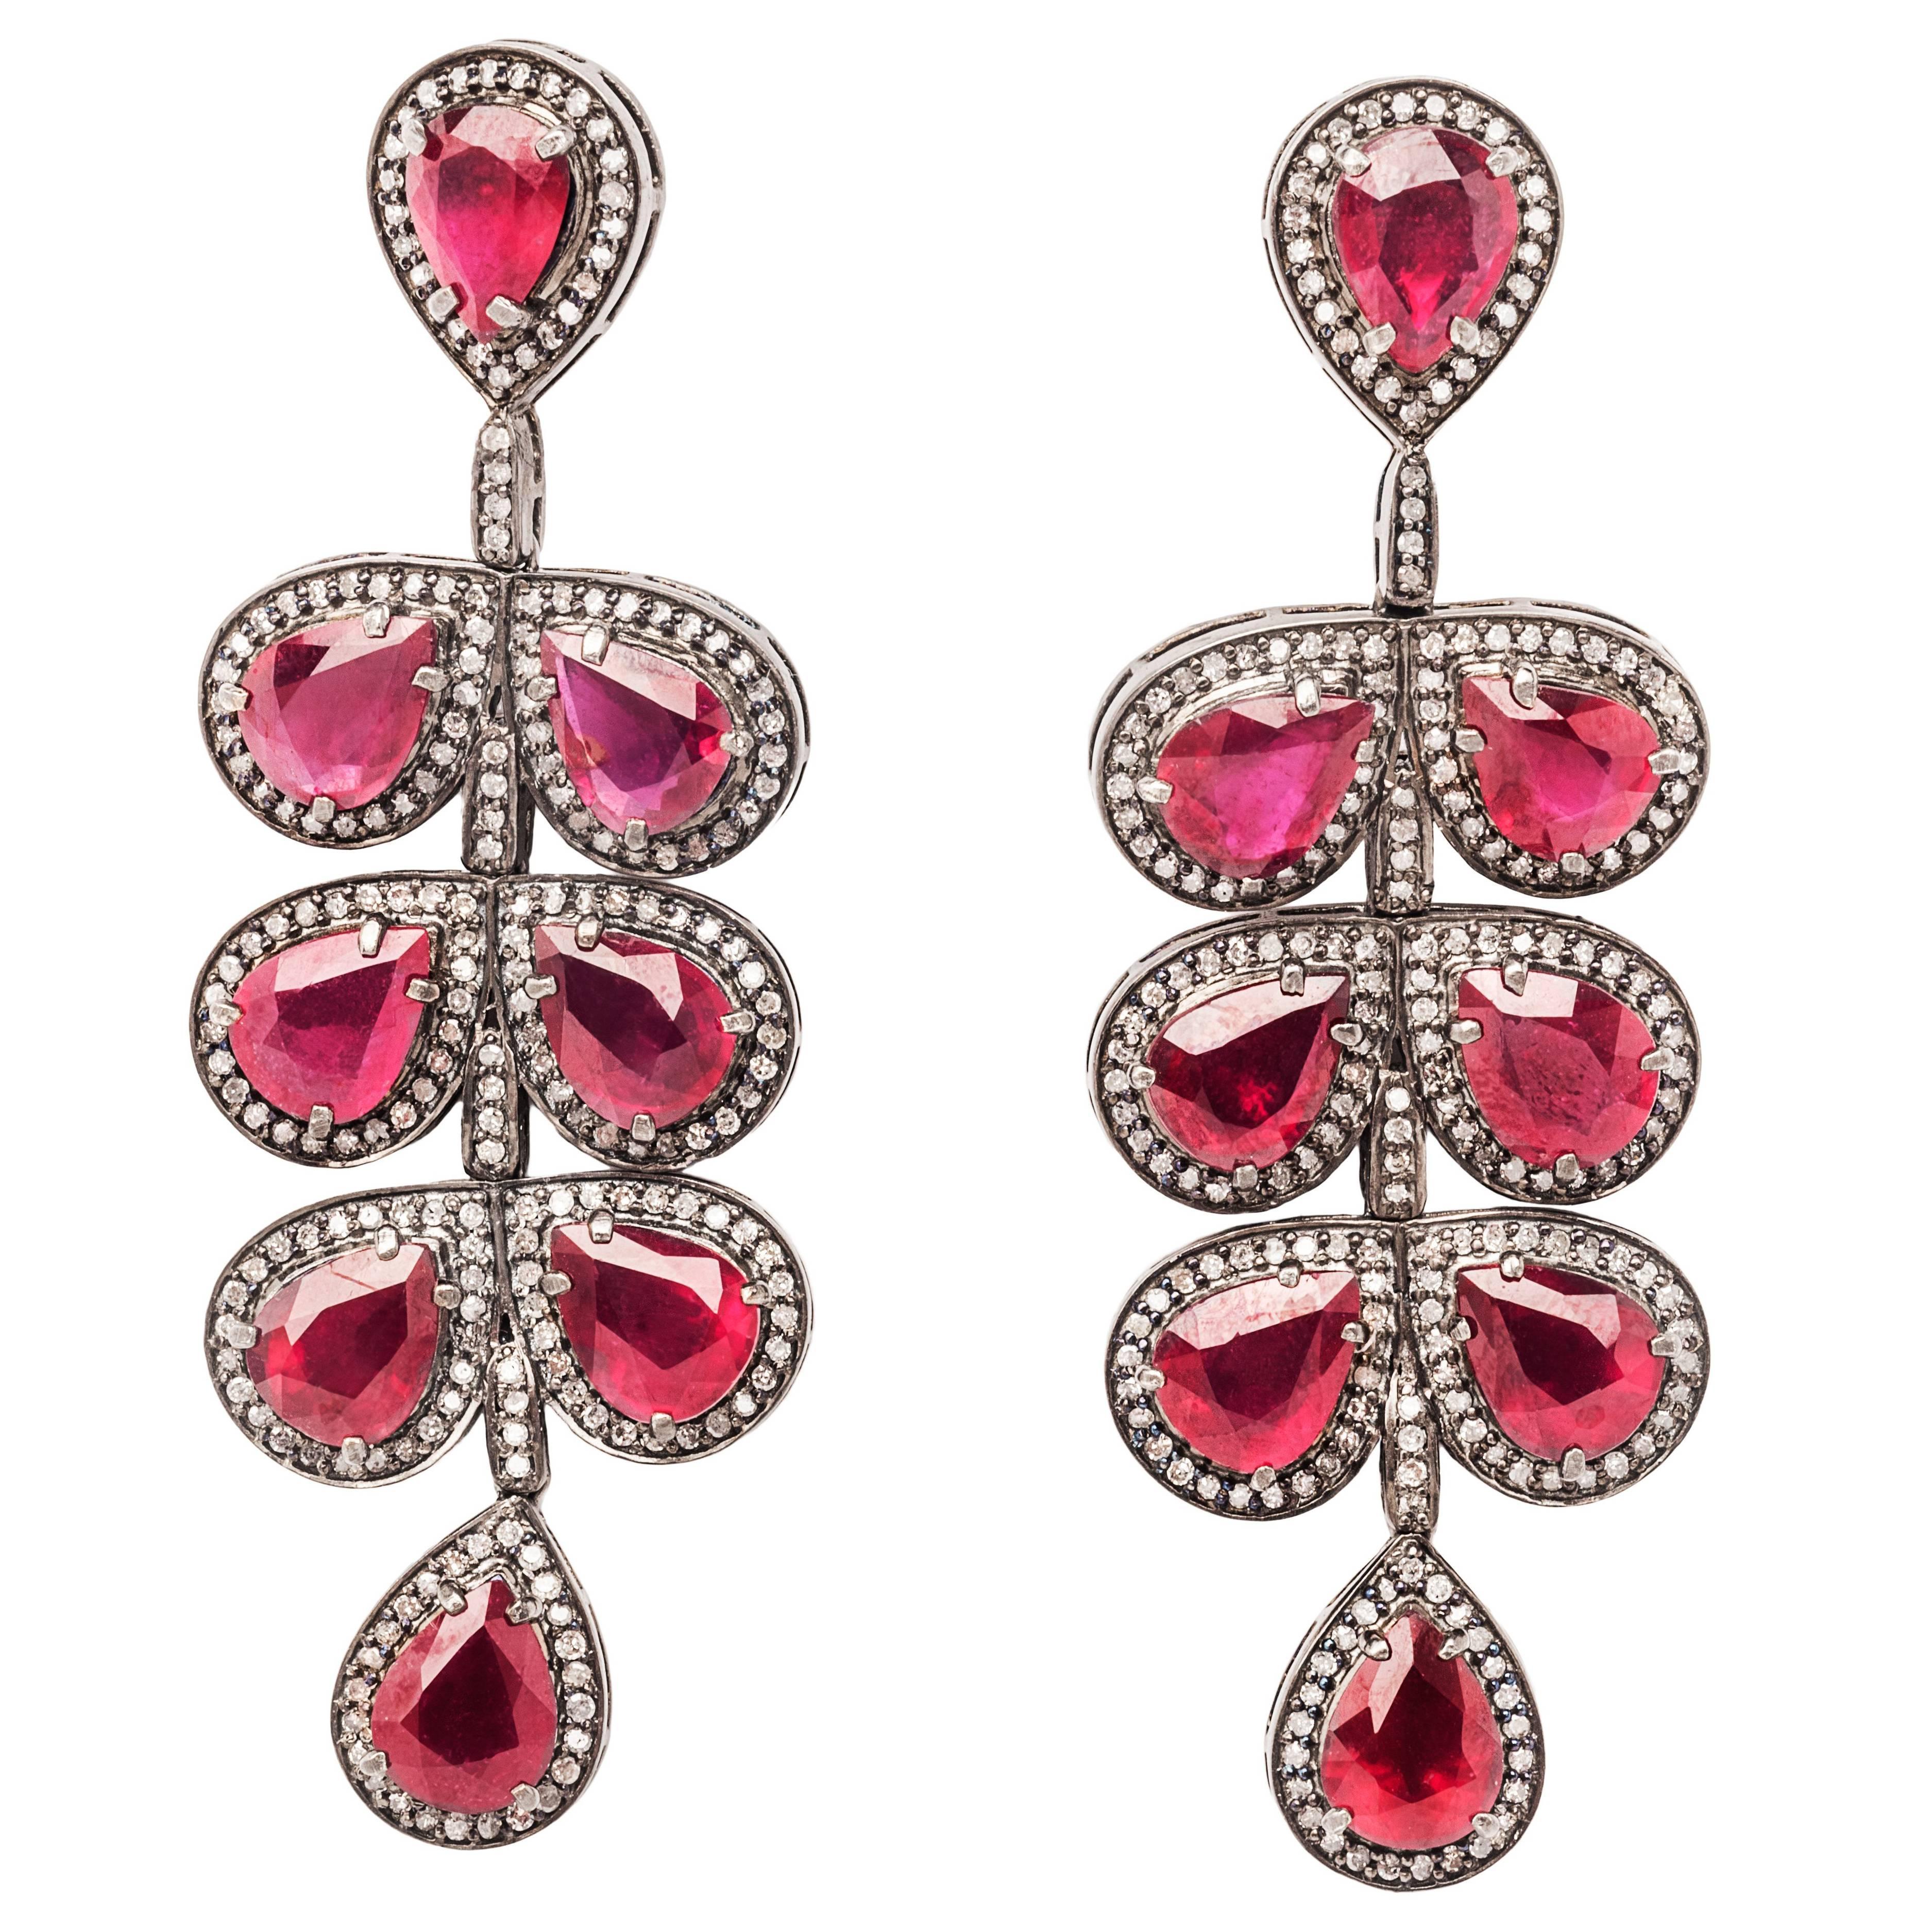 Clarissa Bronfman Ruby and Diamond Statement Chandelier Earrings